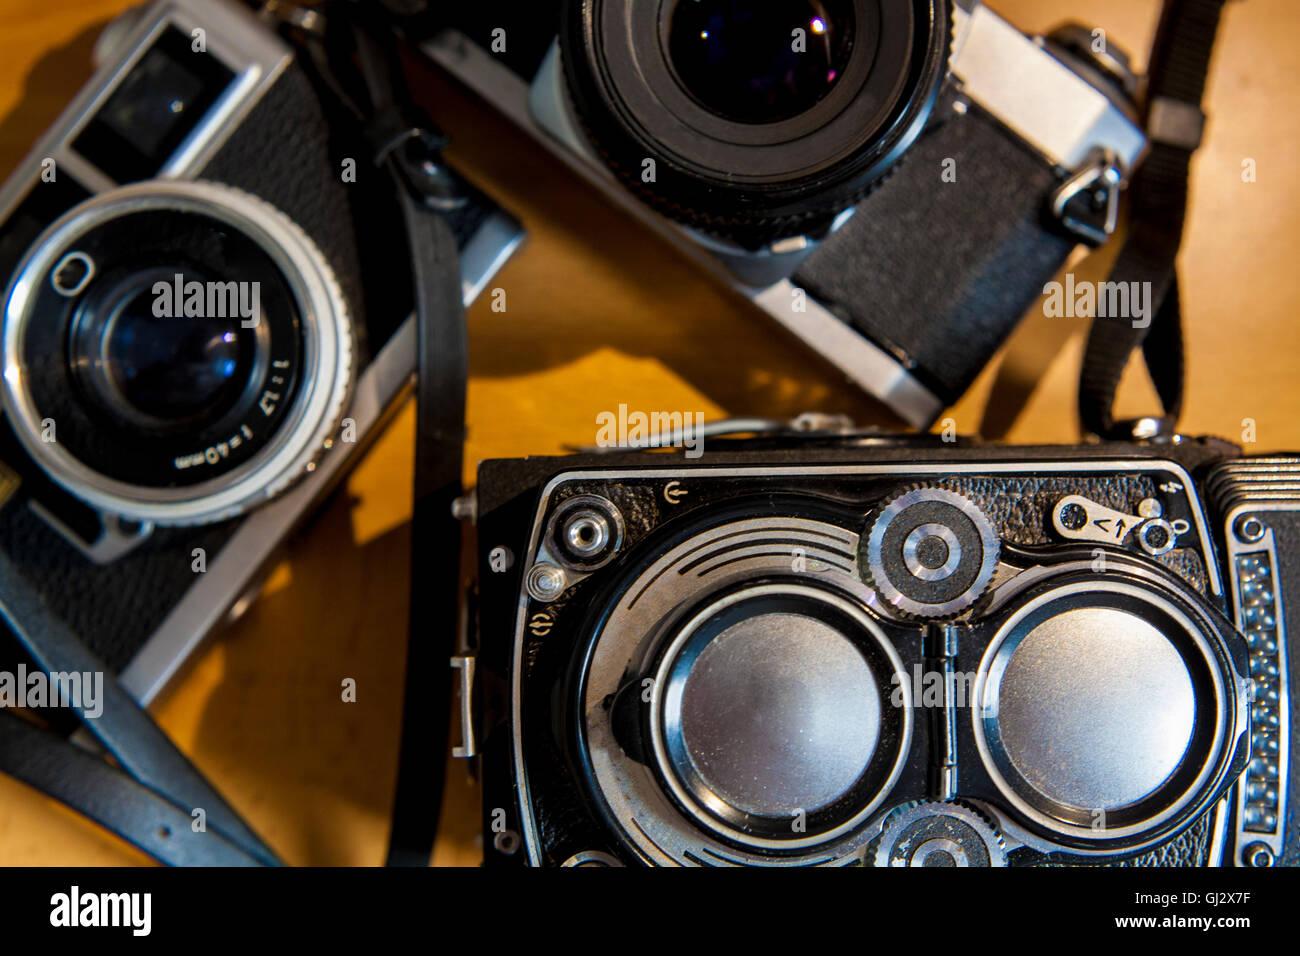 Old film SLR and TLR cameras over wooden background - Stock Image